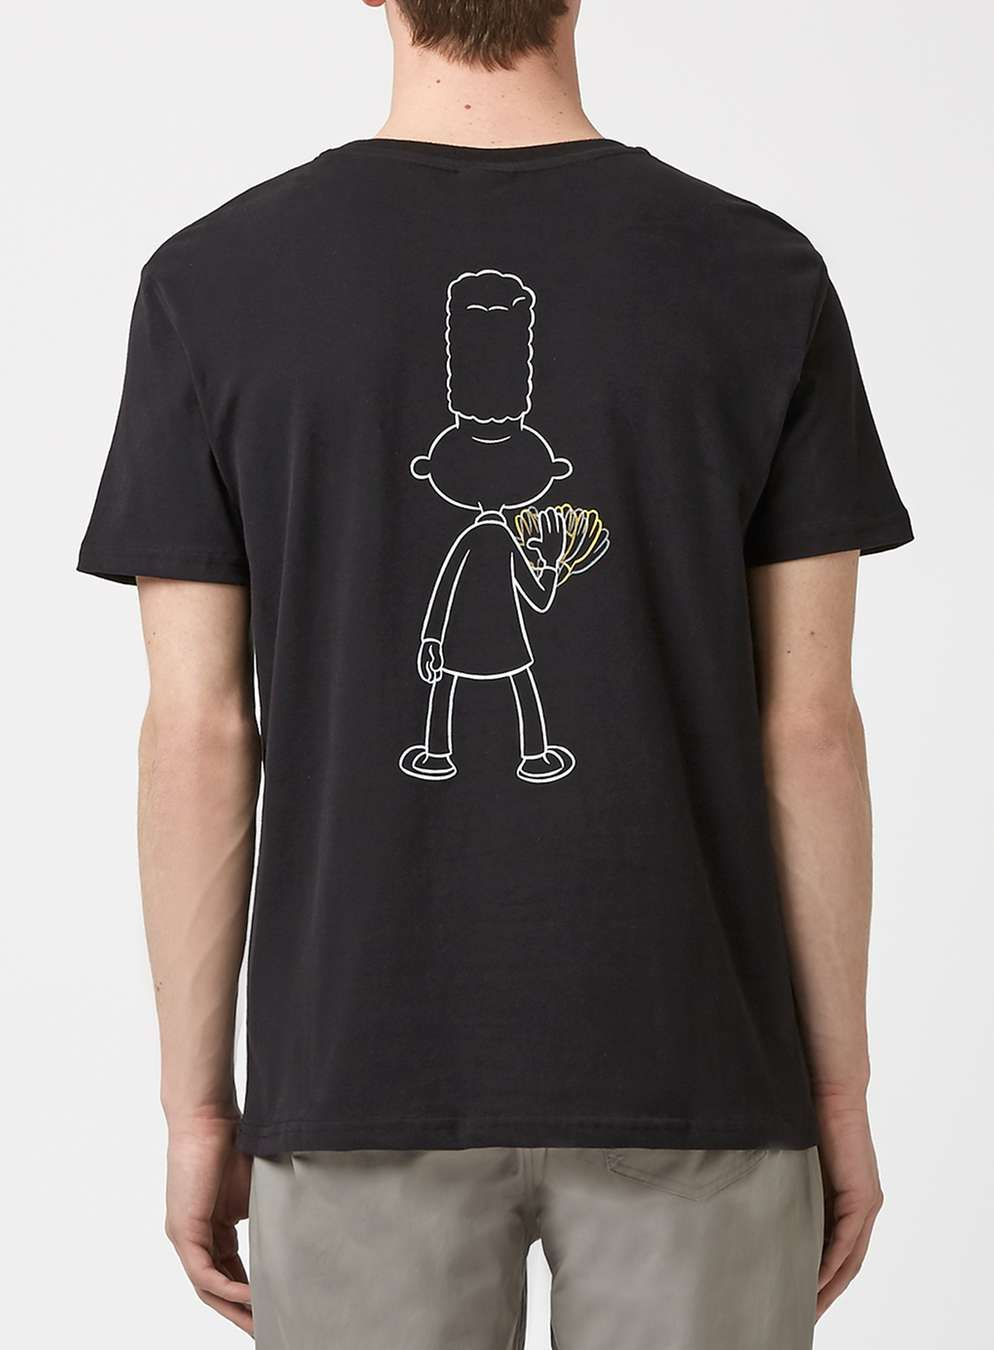 47a29ae5d71 Nickelodeon Black Hey Arnold Gerald Print T-Shirt - Topman